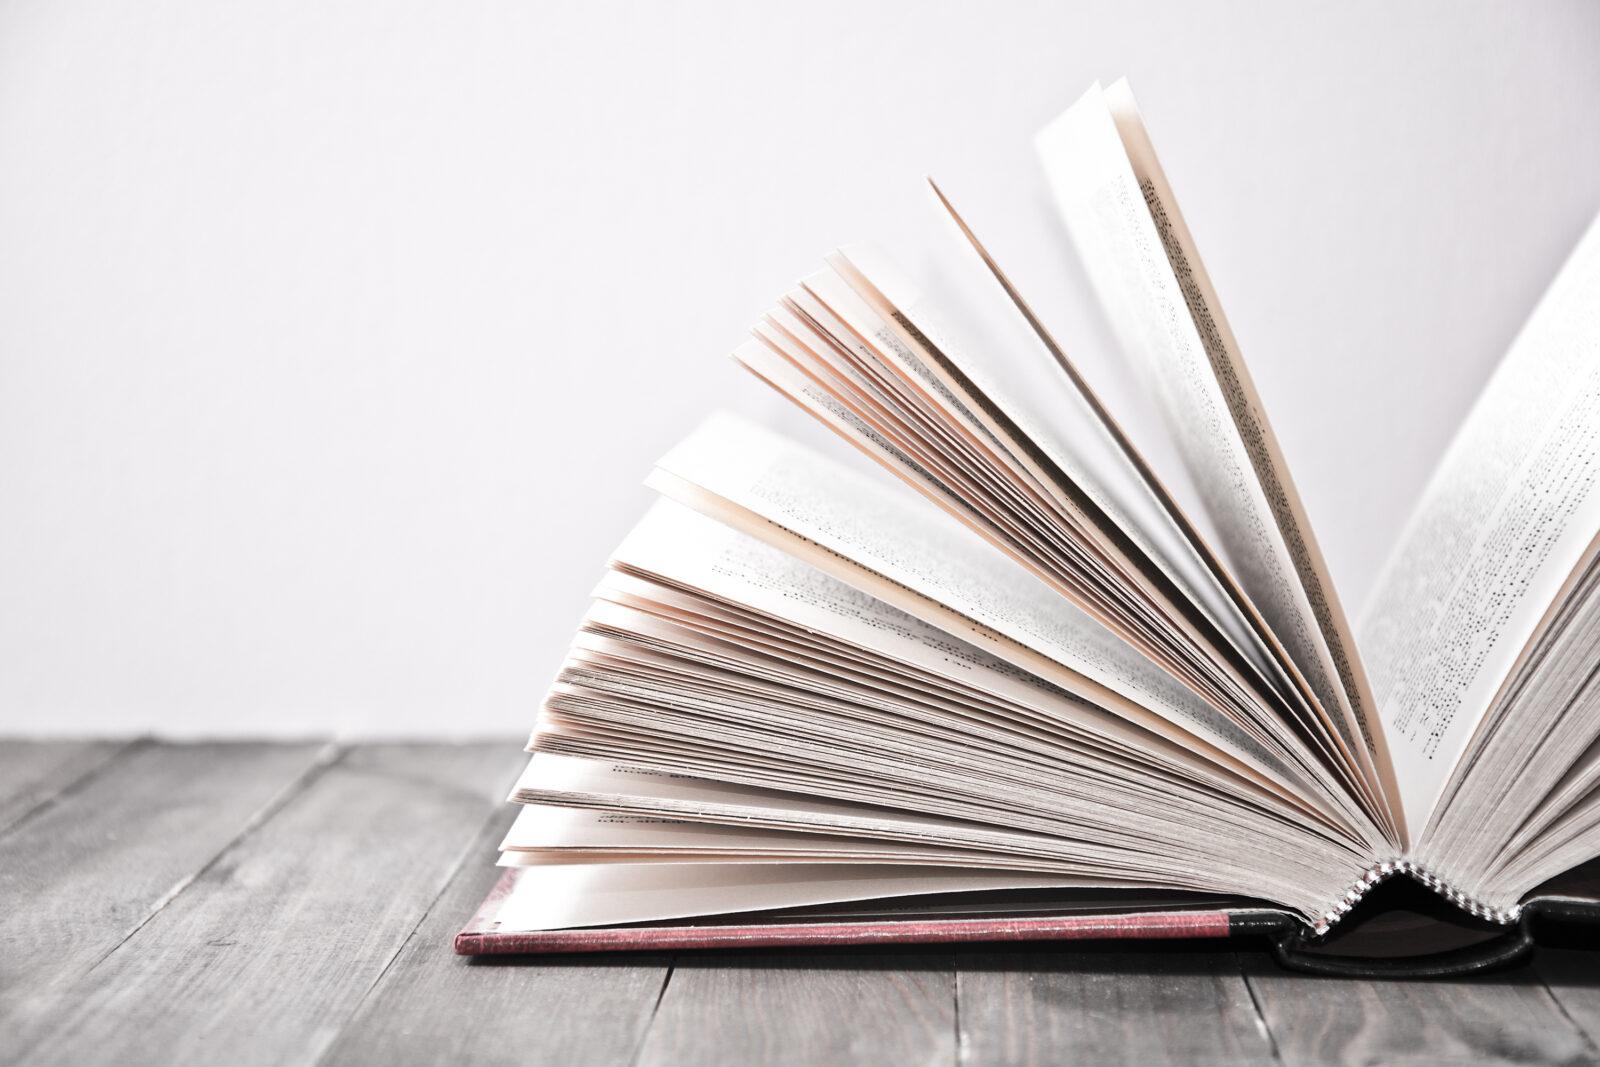 О бессоннице написано много книг